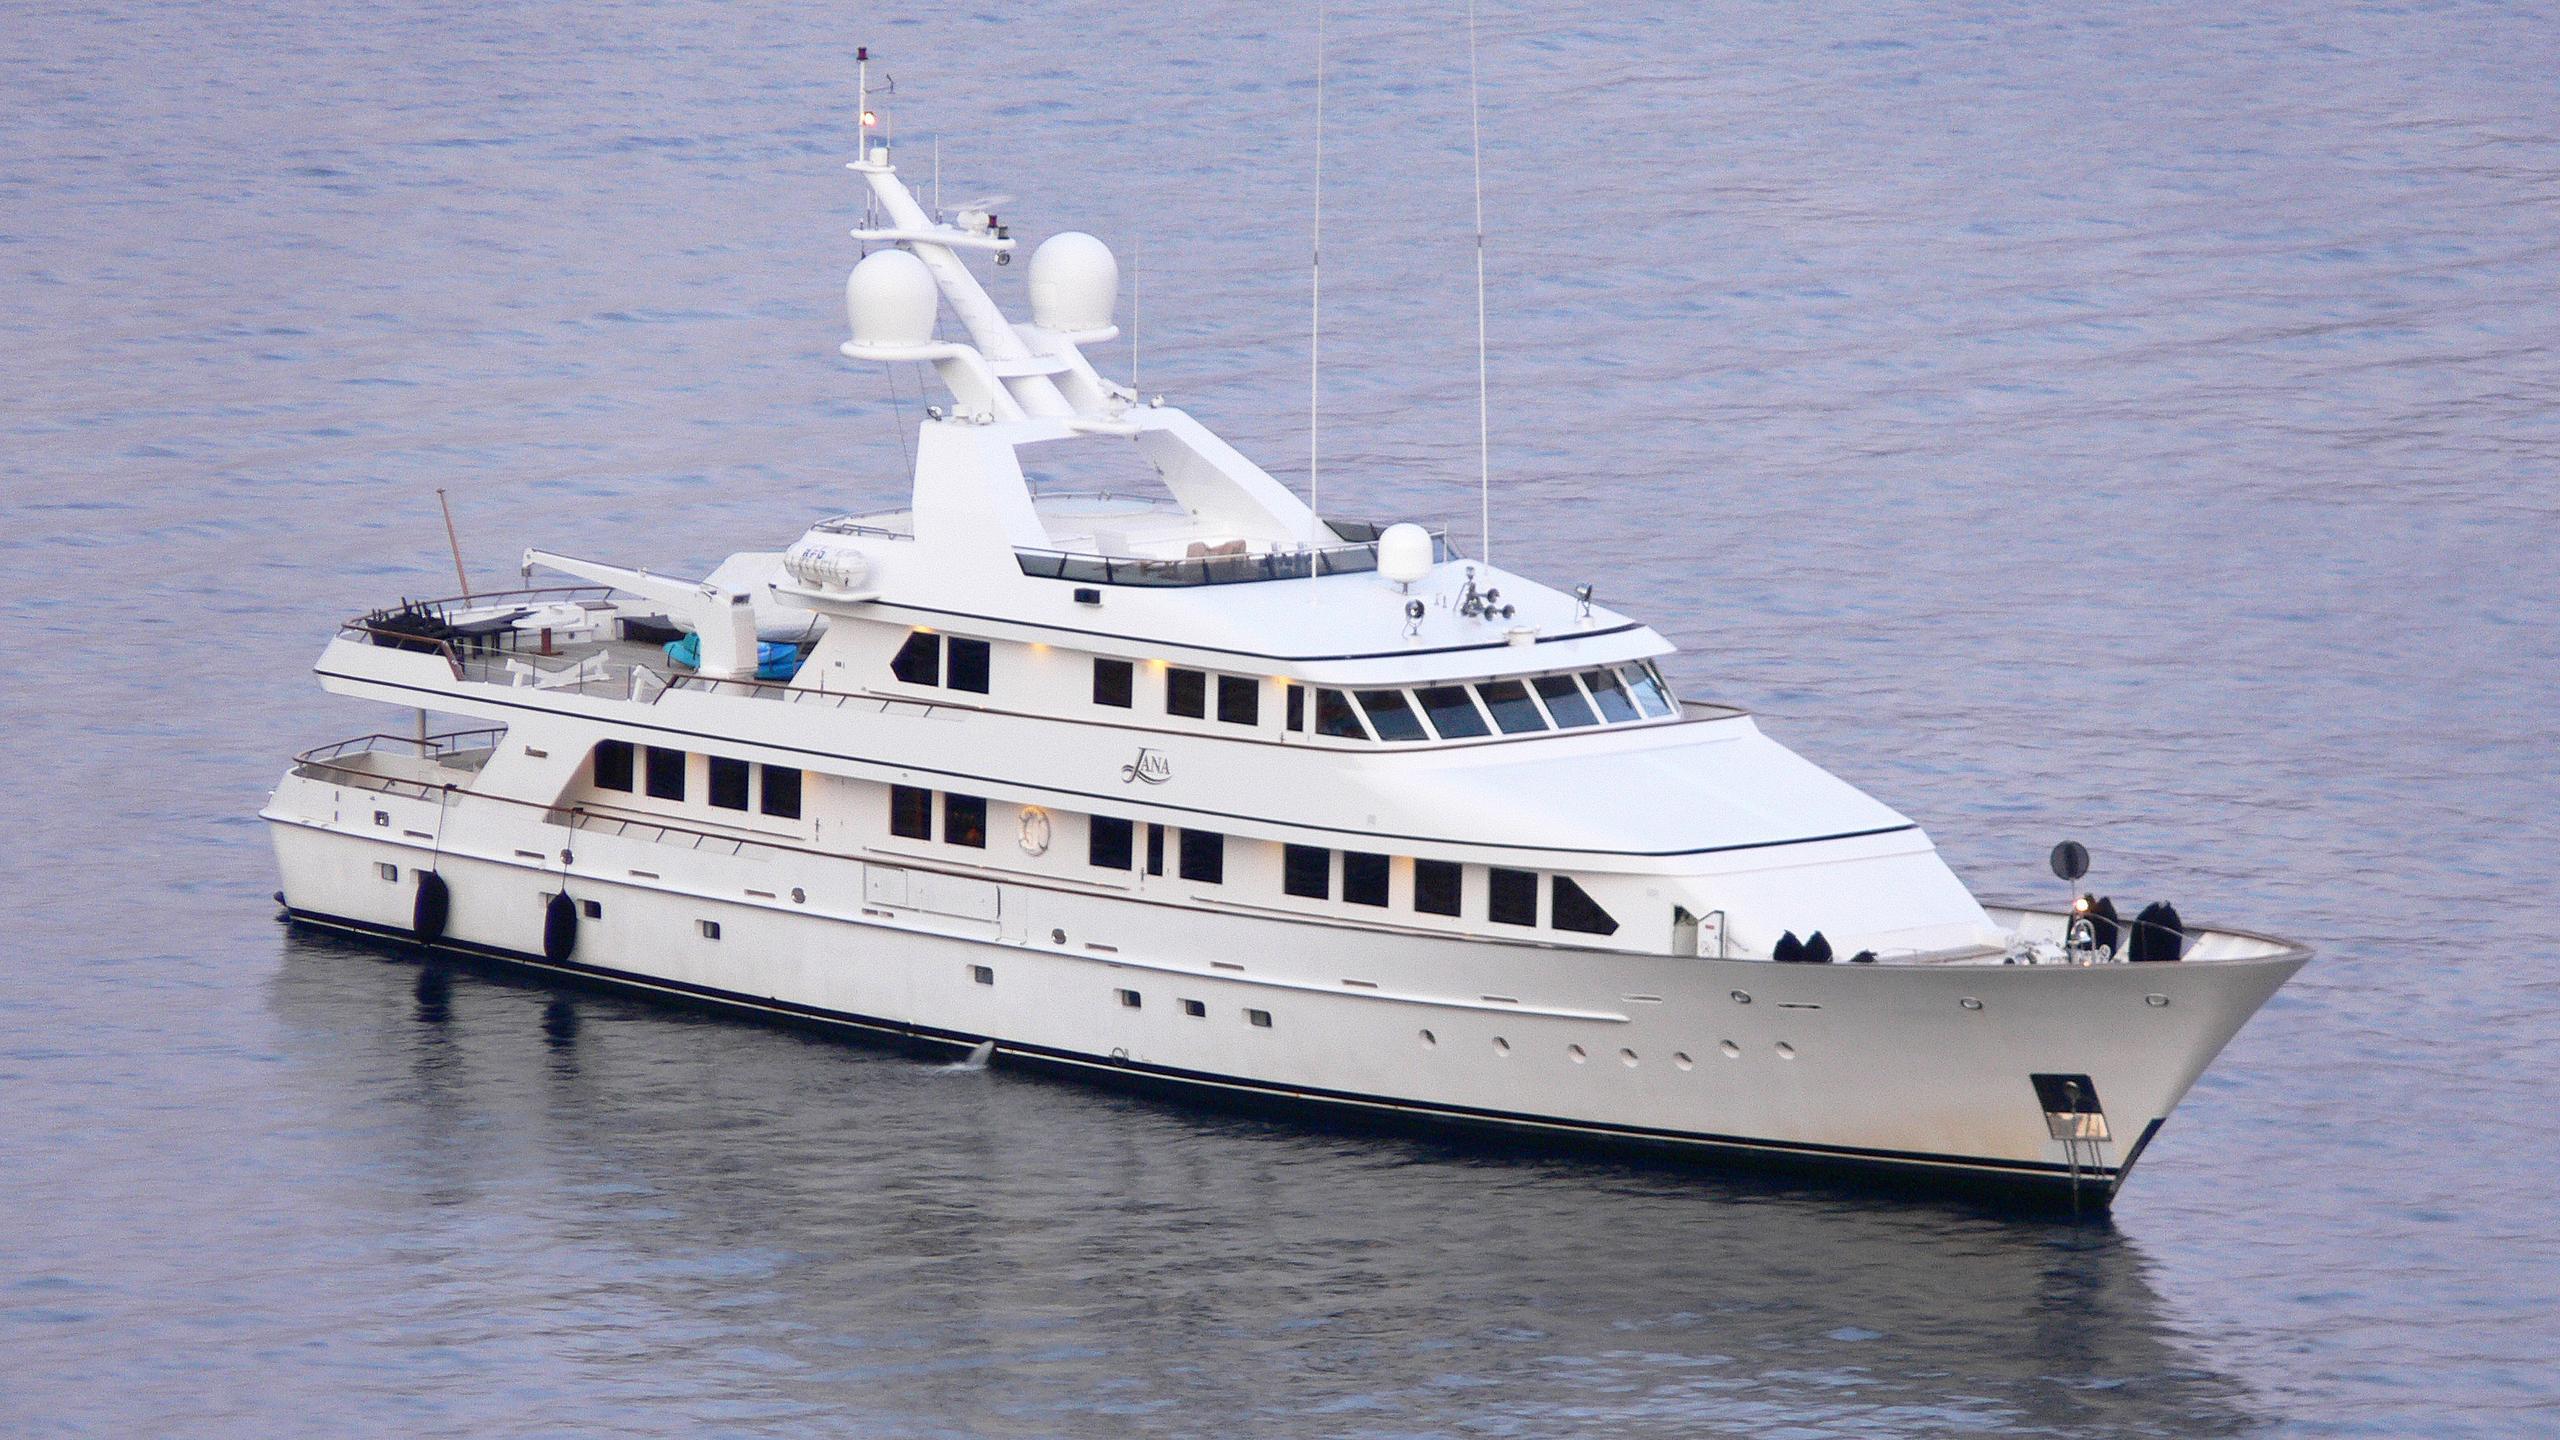 constance-motor-yacht-feadship-1986-46m-half-profile